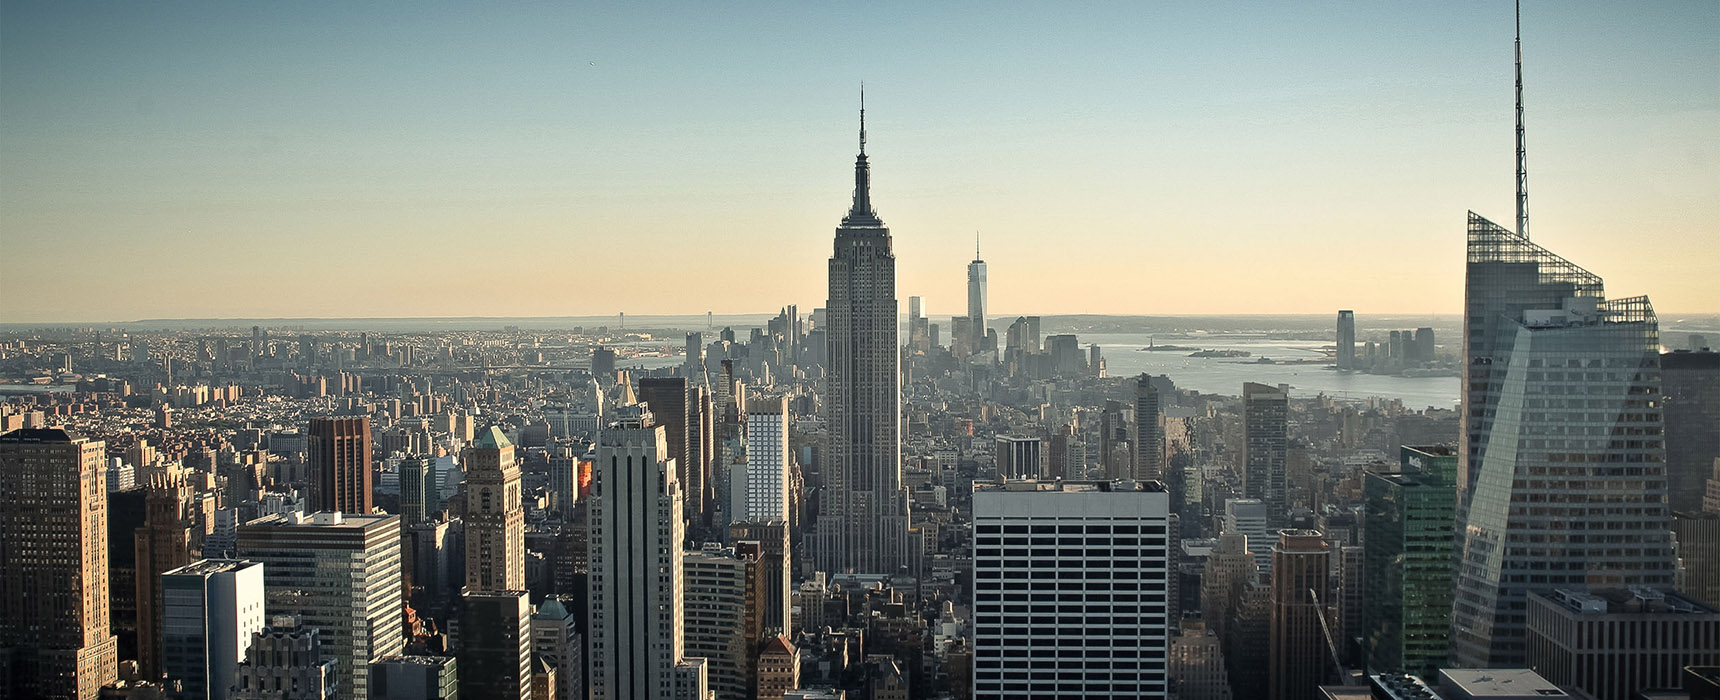 Top of the rock New York Manhattan skyline sunset